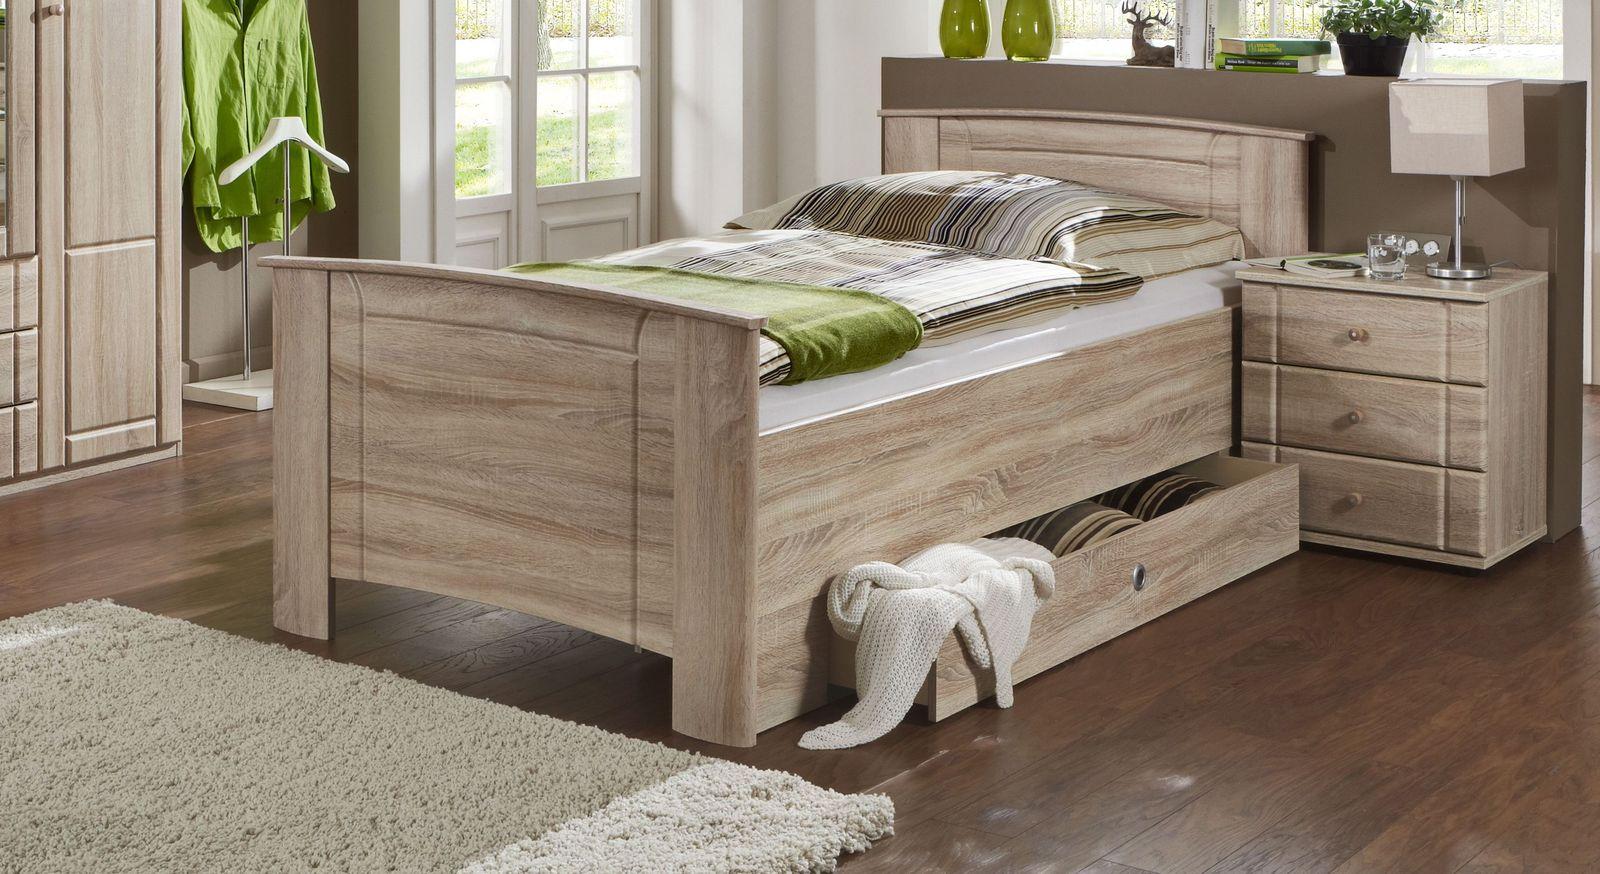 Seniorenbett Carpina mit komfortabler Rahmenhöhe